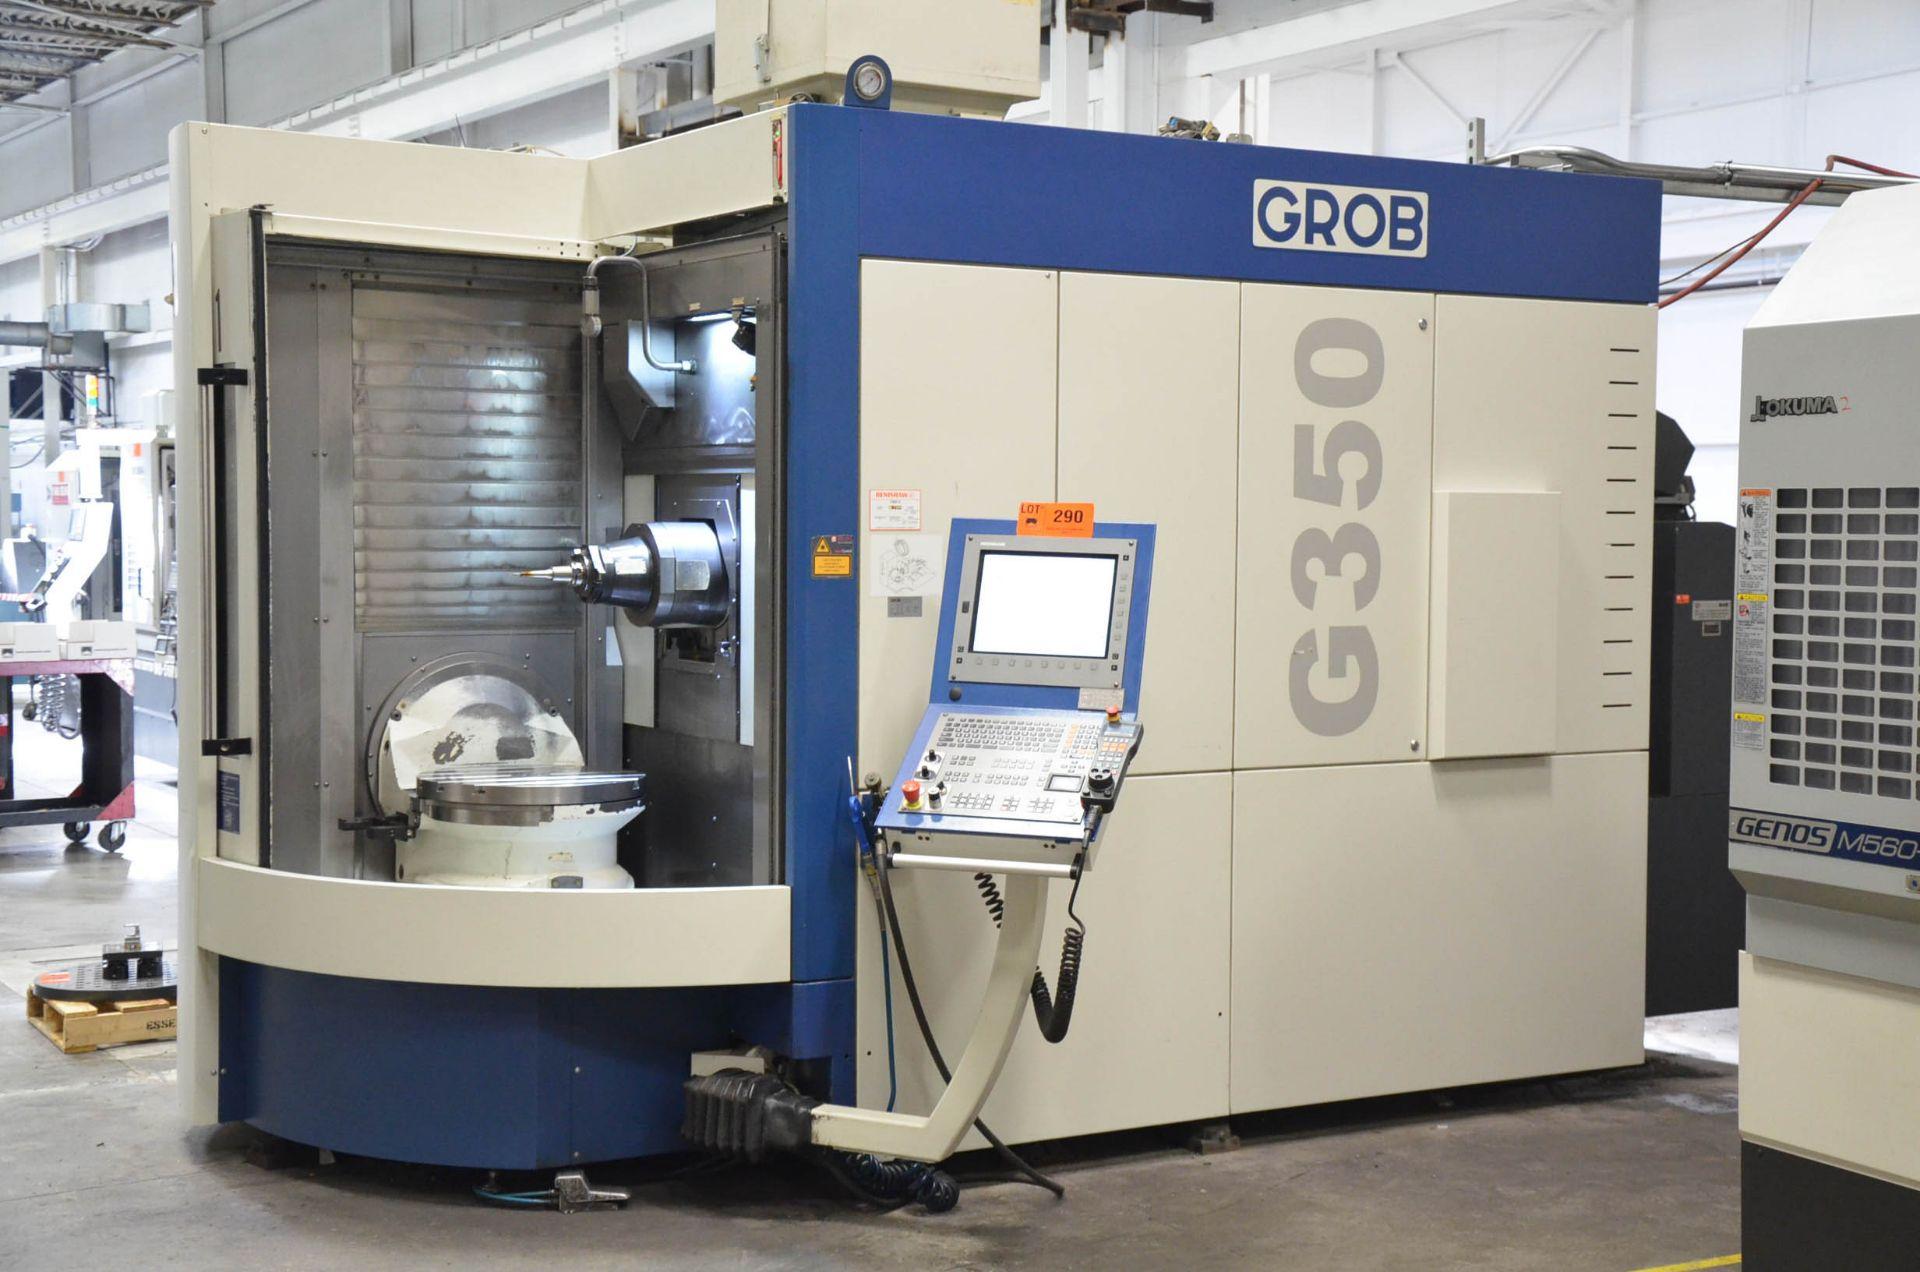 "GROB (2012) G350 5-AXIS CNC MACHINING CENTER WITH HEIDENHAIN ITNC 530 CNC CONTROL, 22.25"" DIAMETER - Image 3 of 12"